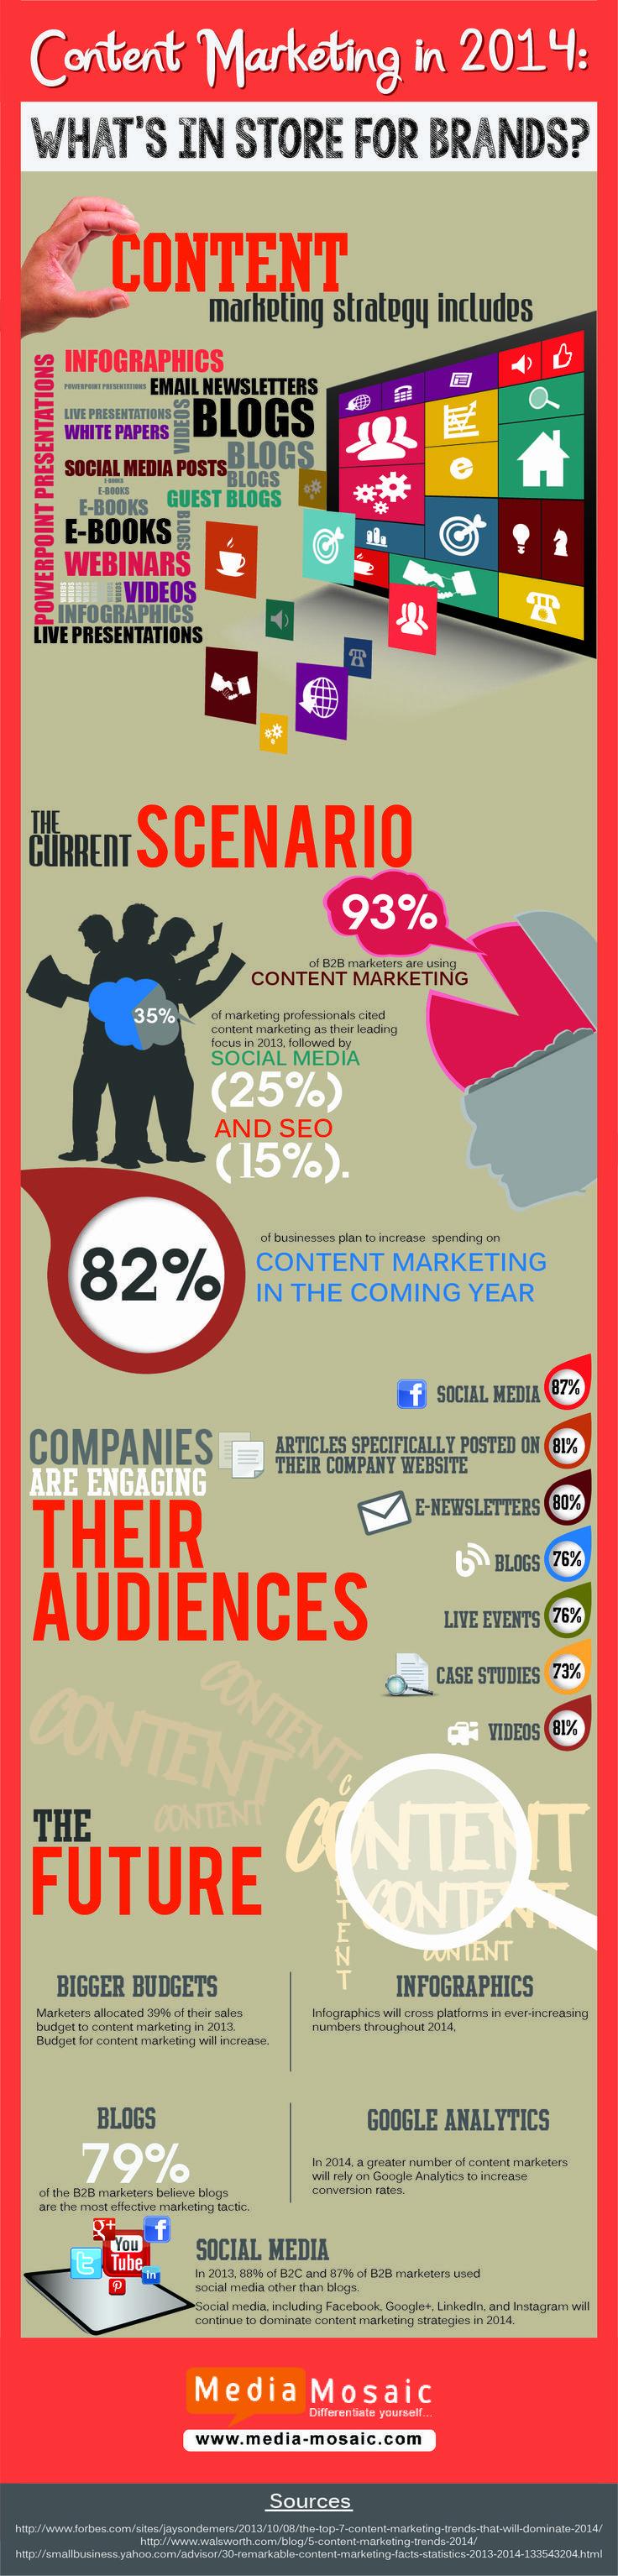 #ContentMarketing 2014